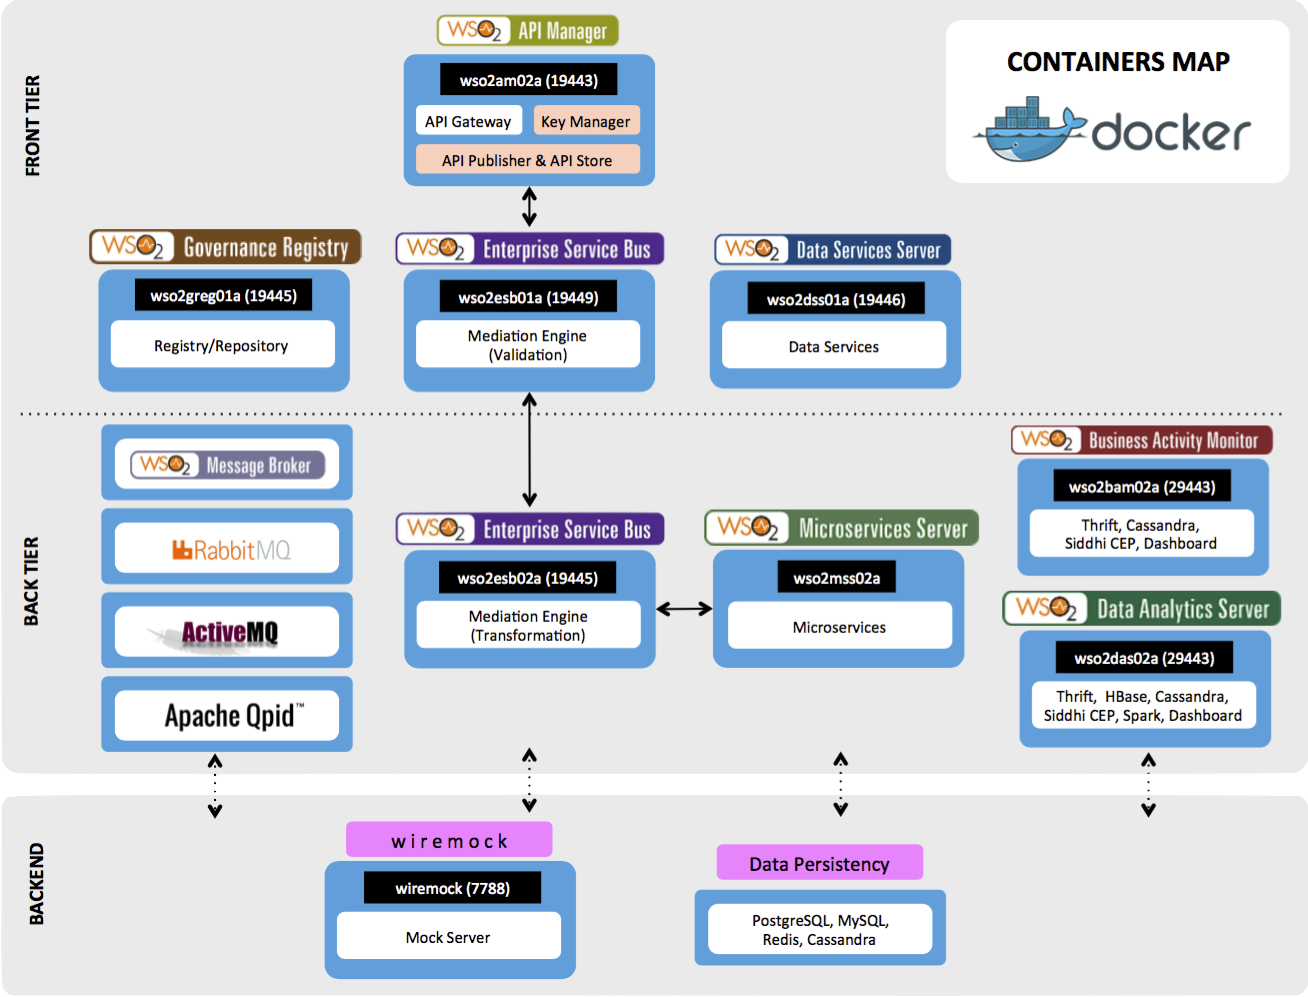 WSO2 Development Server - Docker Containers Map